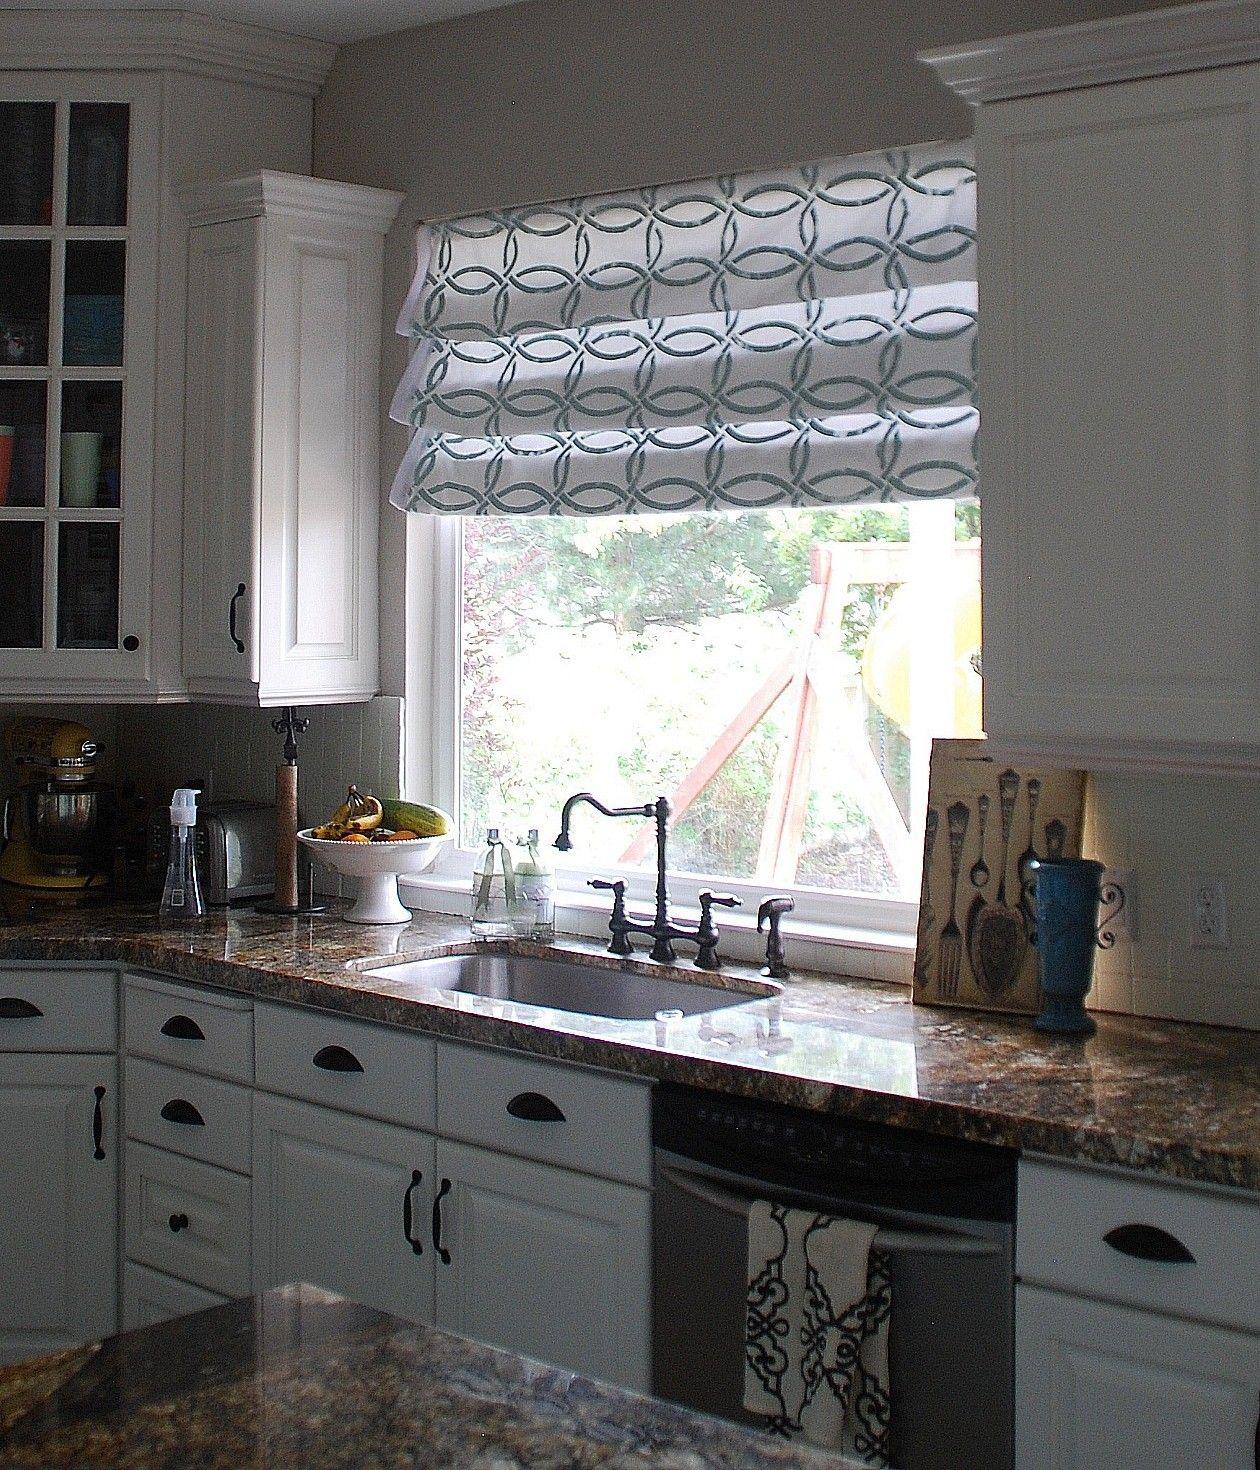 Roman curtains kitchen - 17 Best Images About Windows Curtains Blinds On Pinterest Hunter Douglas Paint Colors And Bay Window Treatments Download Roman Curtains Kitchen